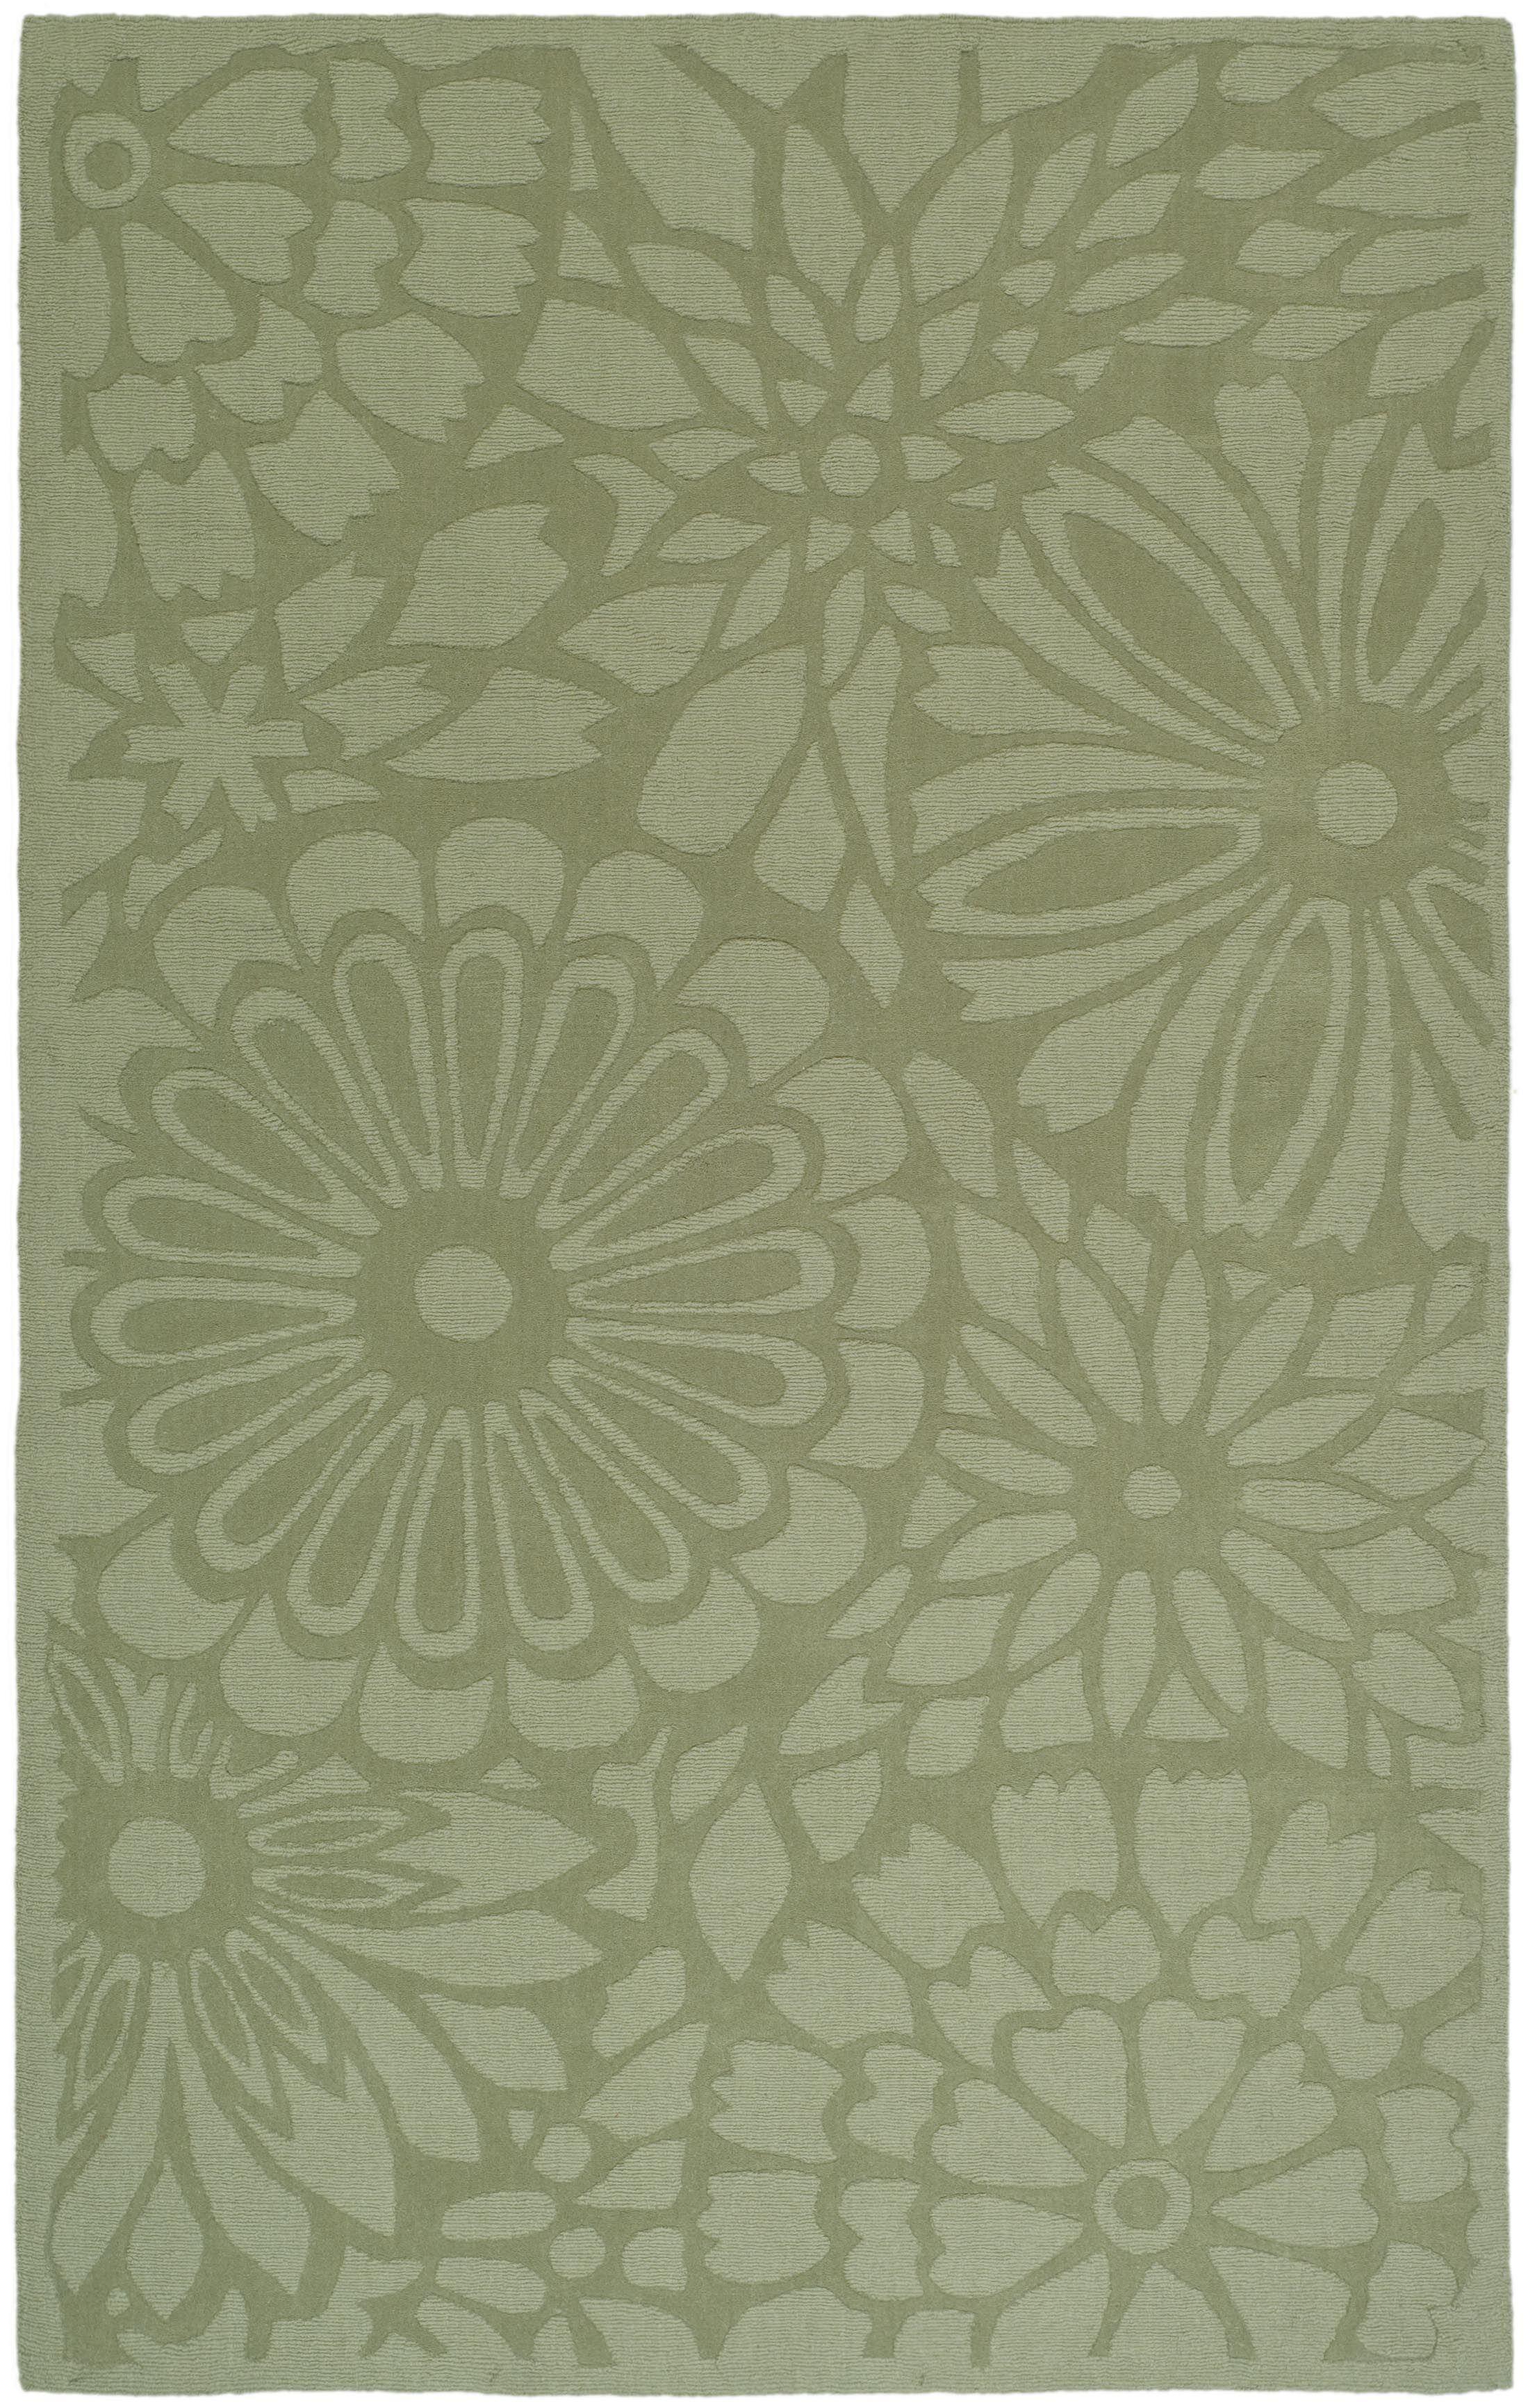 Full Bloom Hand-Woomed Beige/Green Area Rug Rug Size: Rectangle 8' x 10'